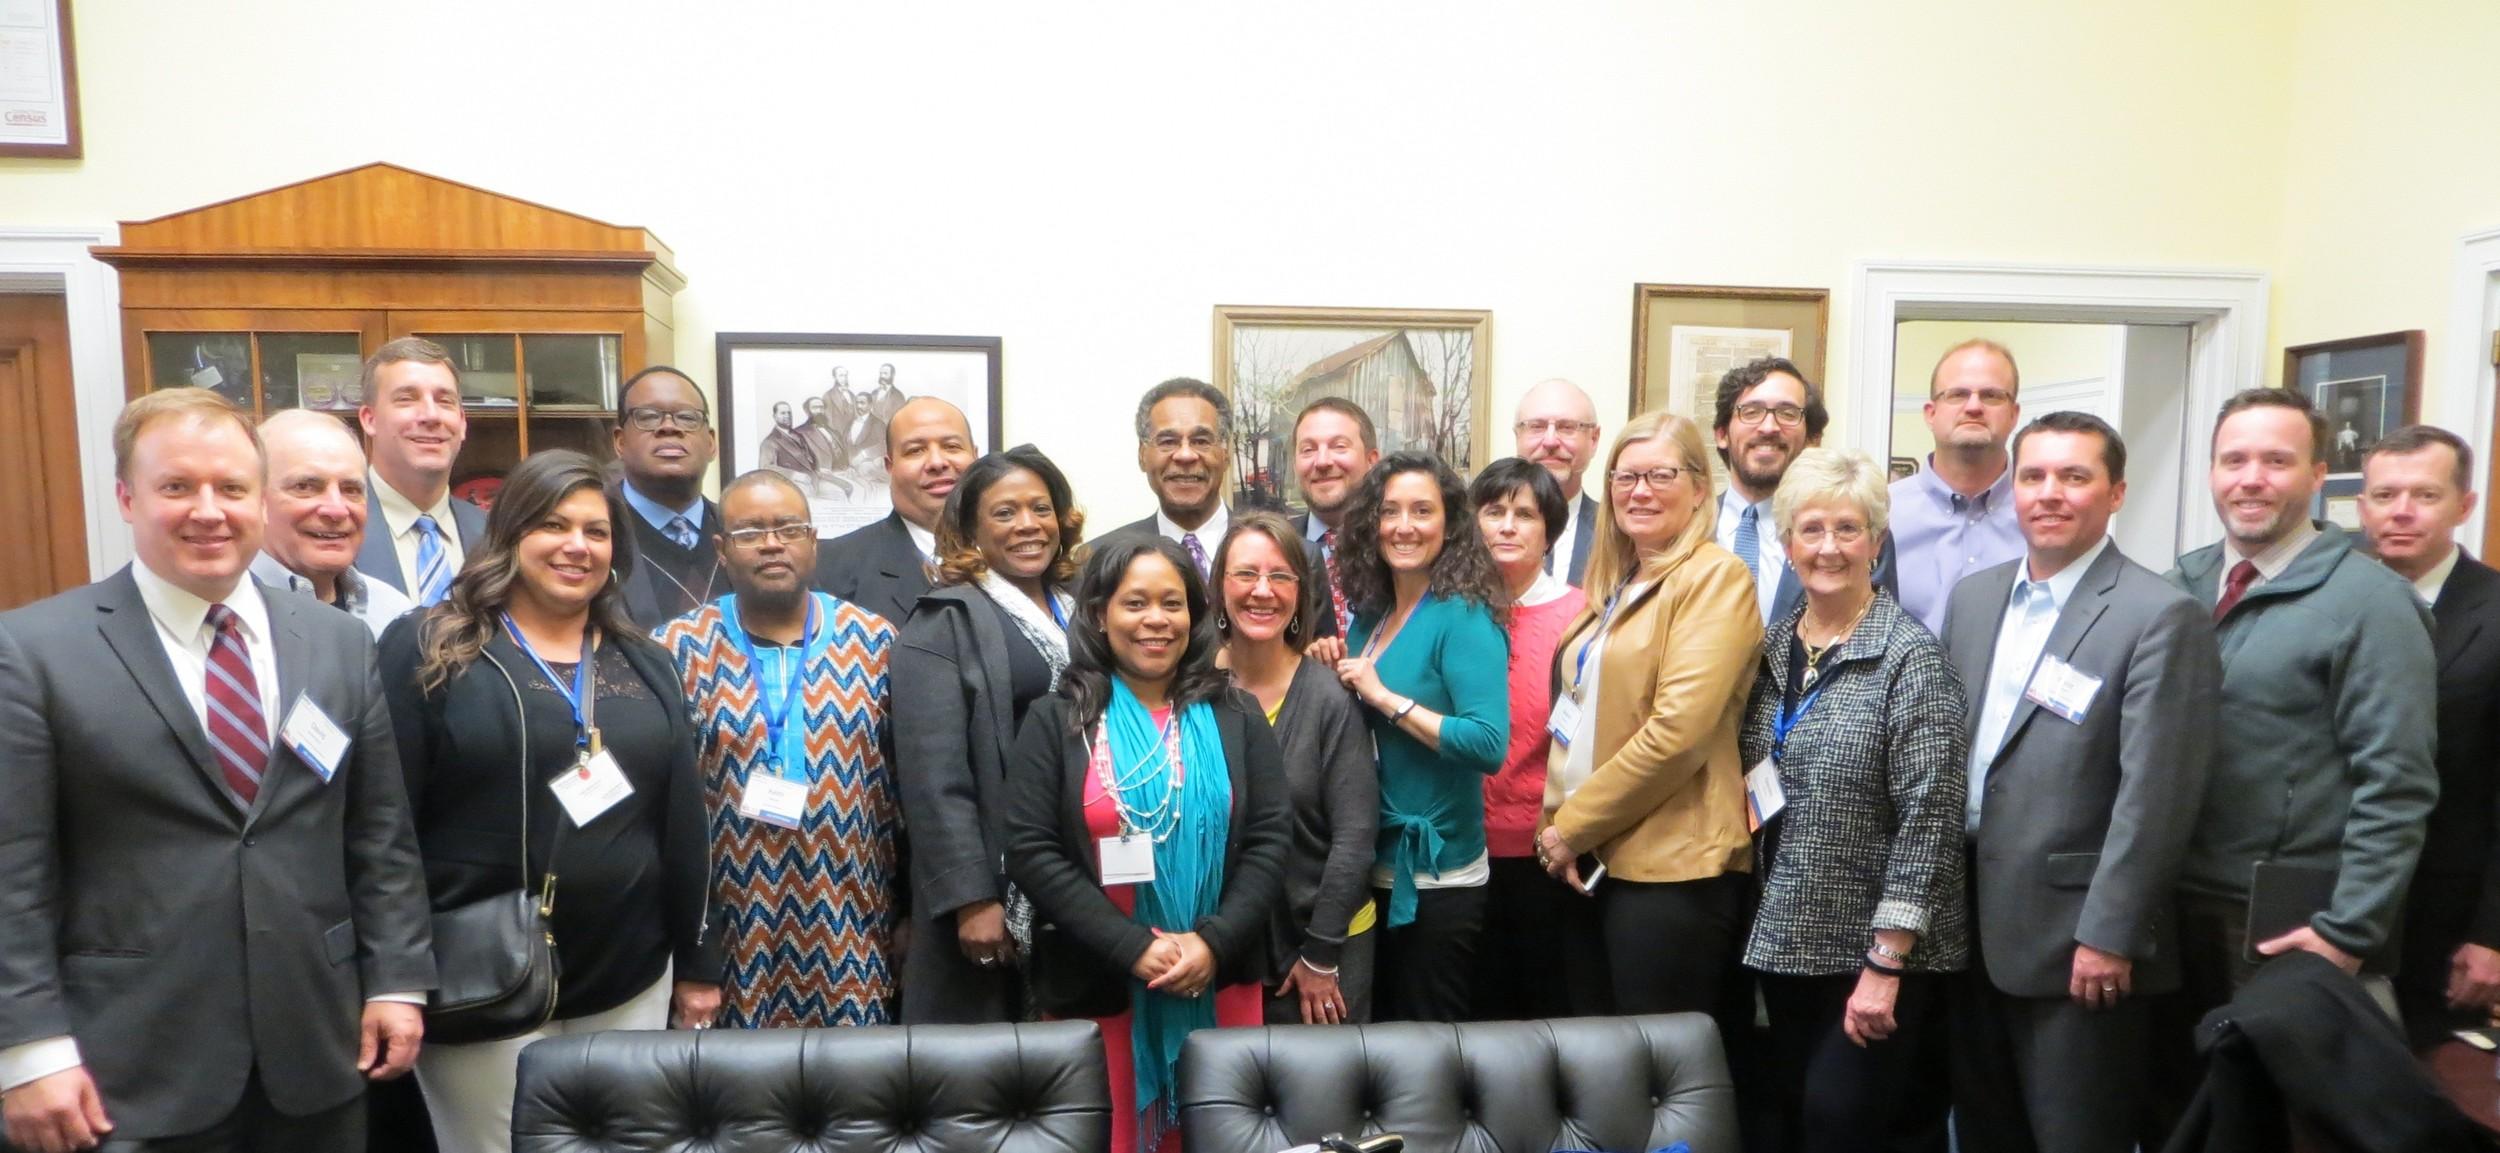 2015-2016 EPFP fellows with U.S. Congressman Emanuel Cleaver II.